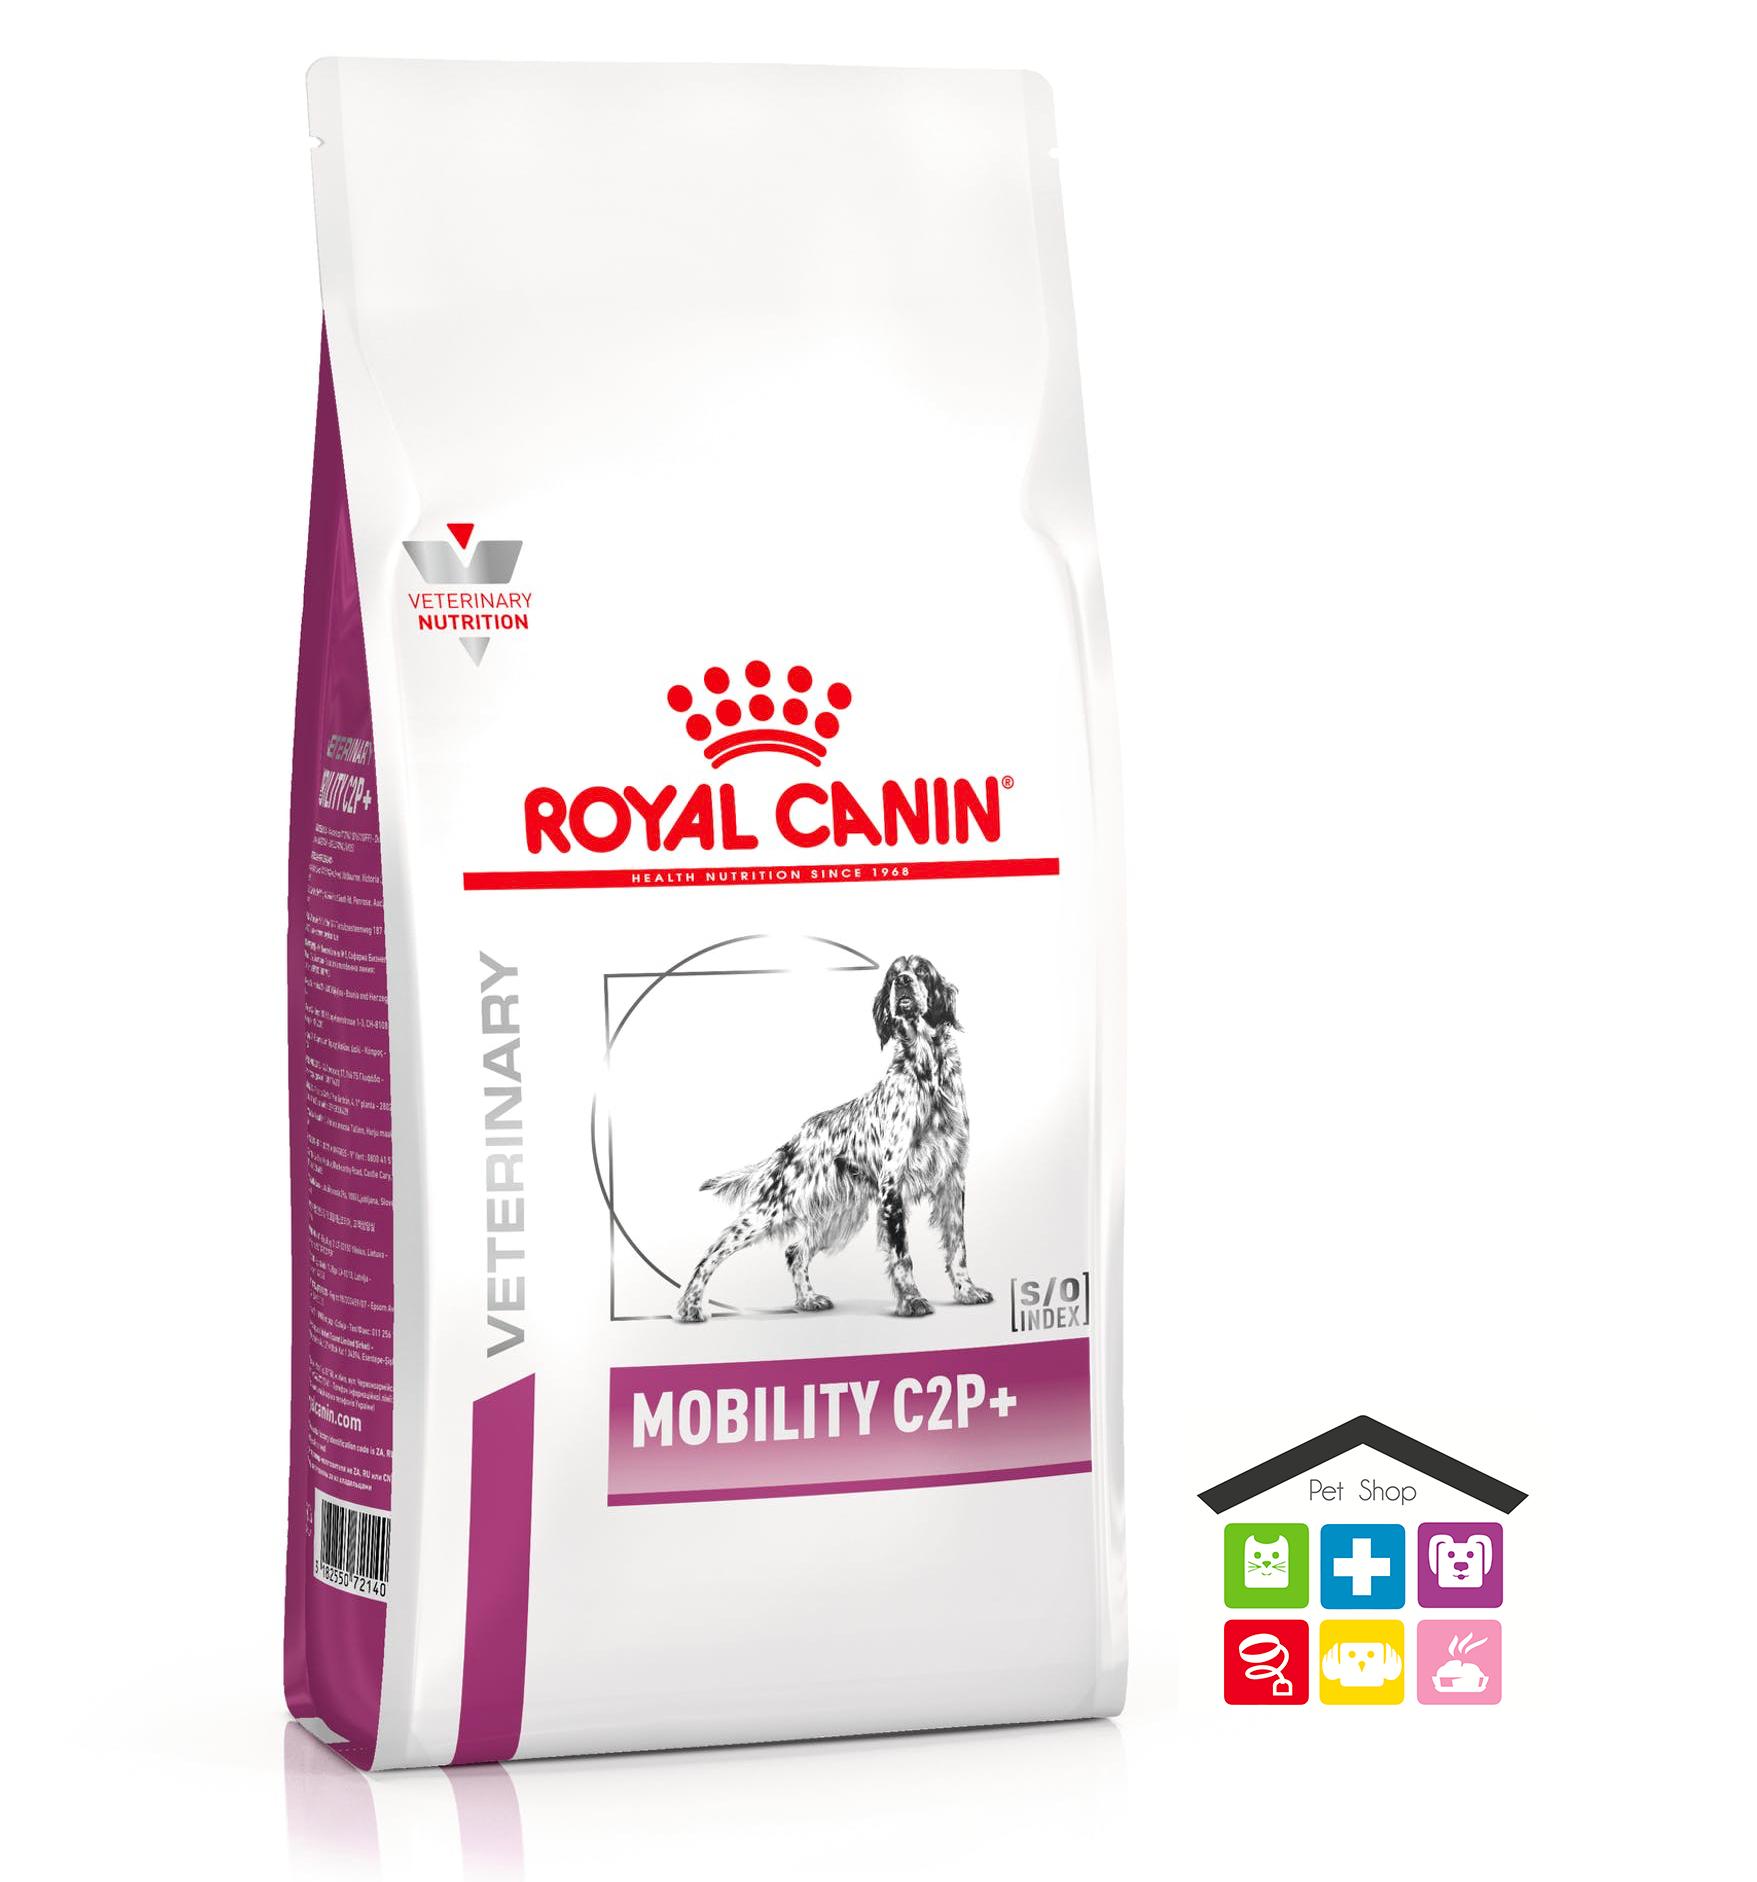 Royal Canin Cane | Linea Vet | MOBILITY C2P+ - 2/12 KG